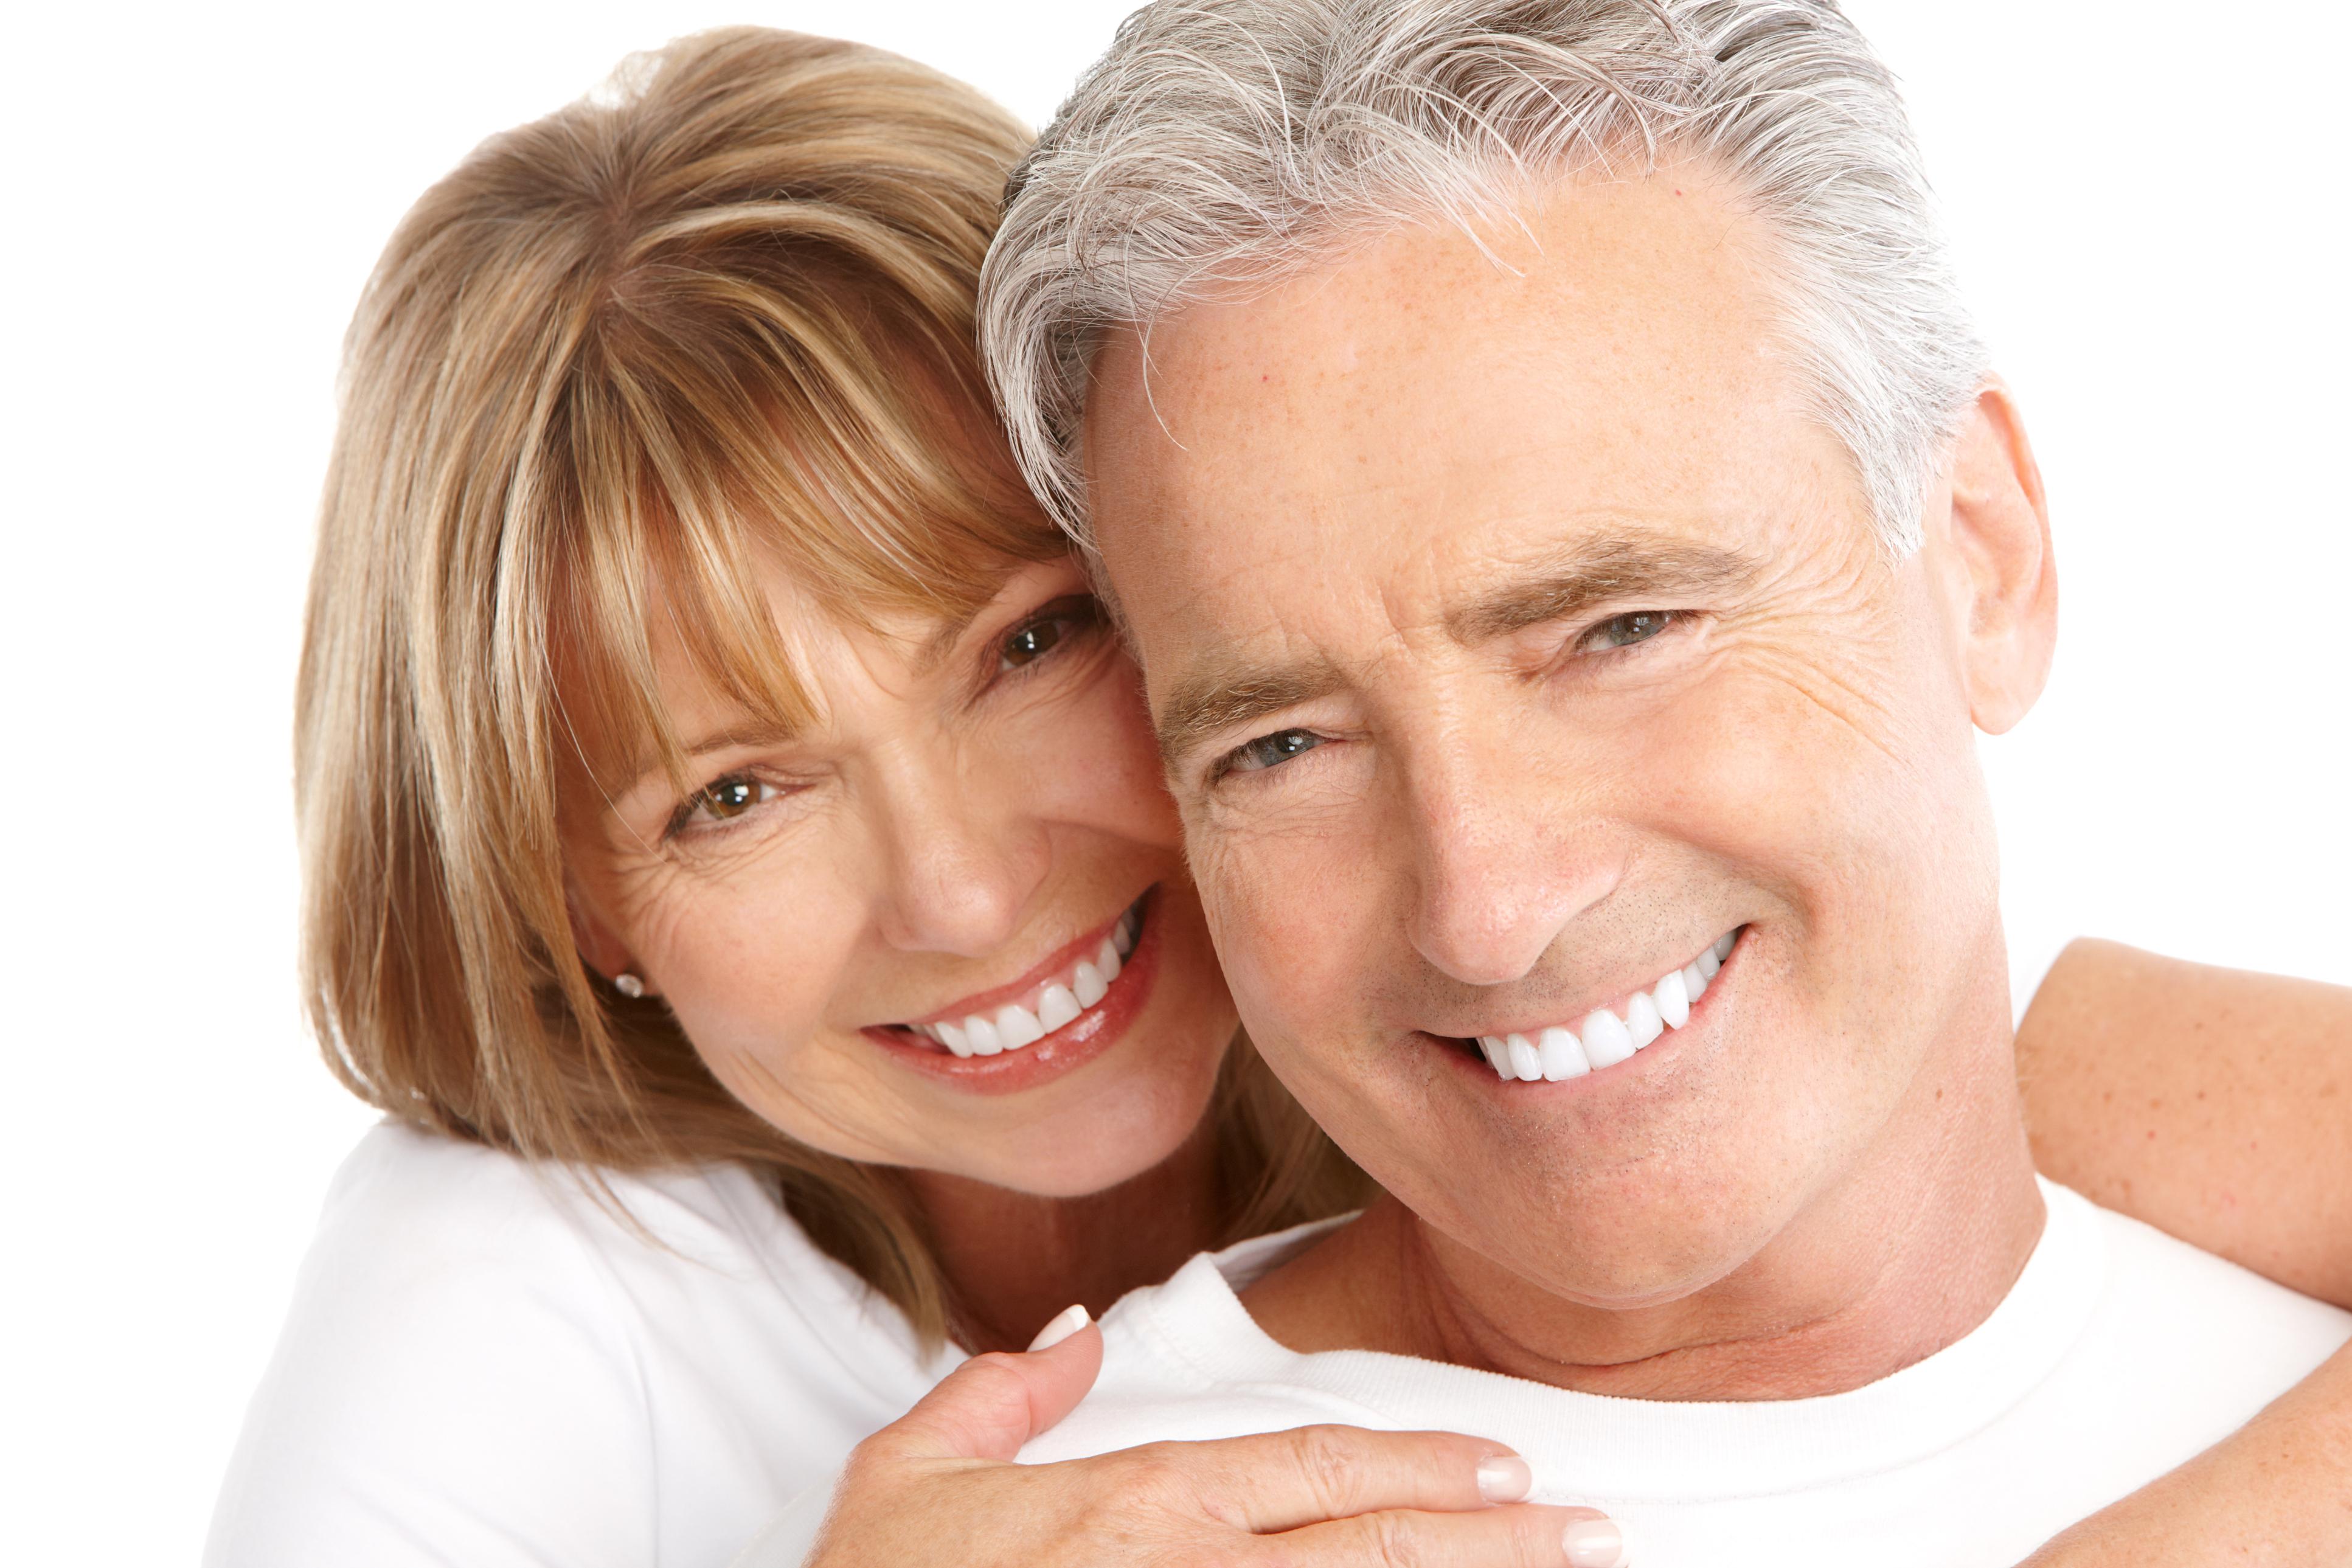 Cleveland Eye Clinic reviews | Laser Eye Surgery/Lasik at 7001 S. Edgerton Rd. - Brecksville OH